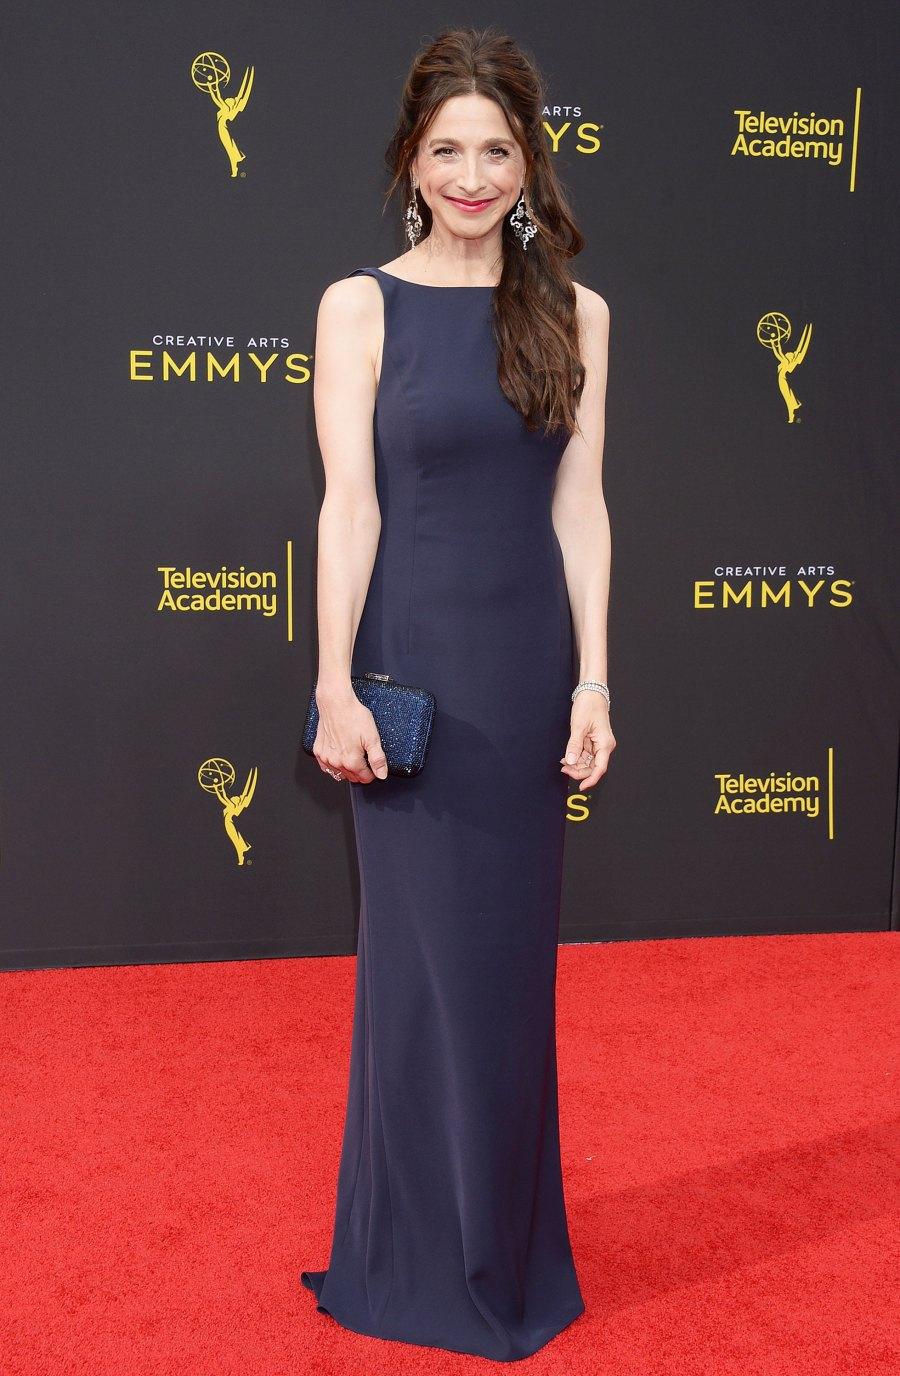 Creative Arts Emmys - Marin Hinkle